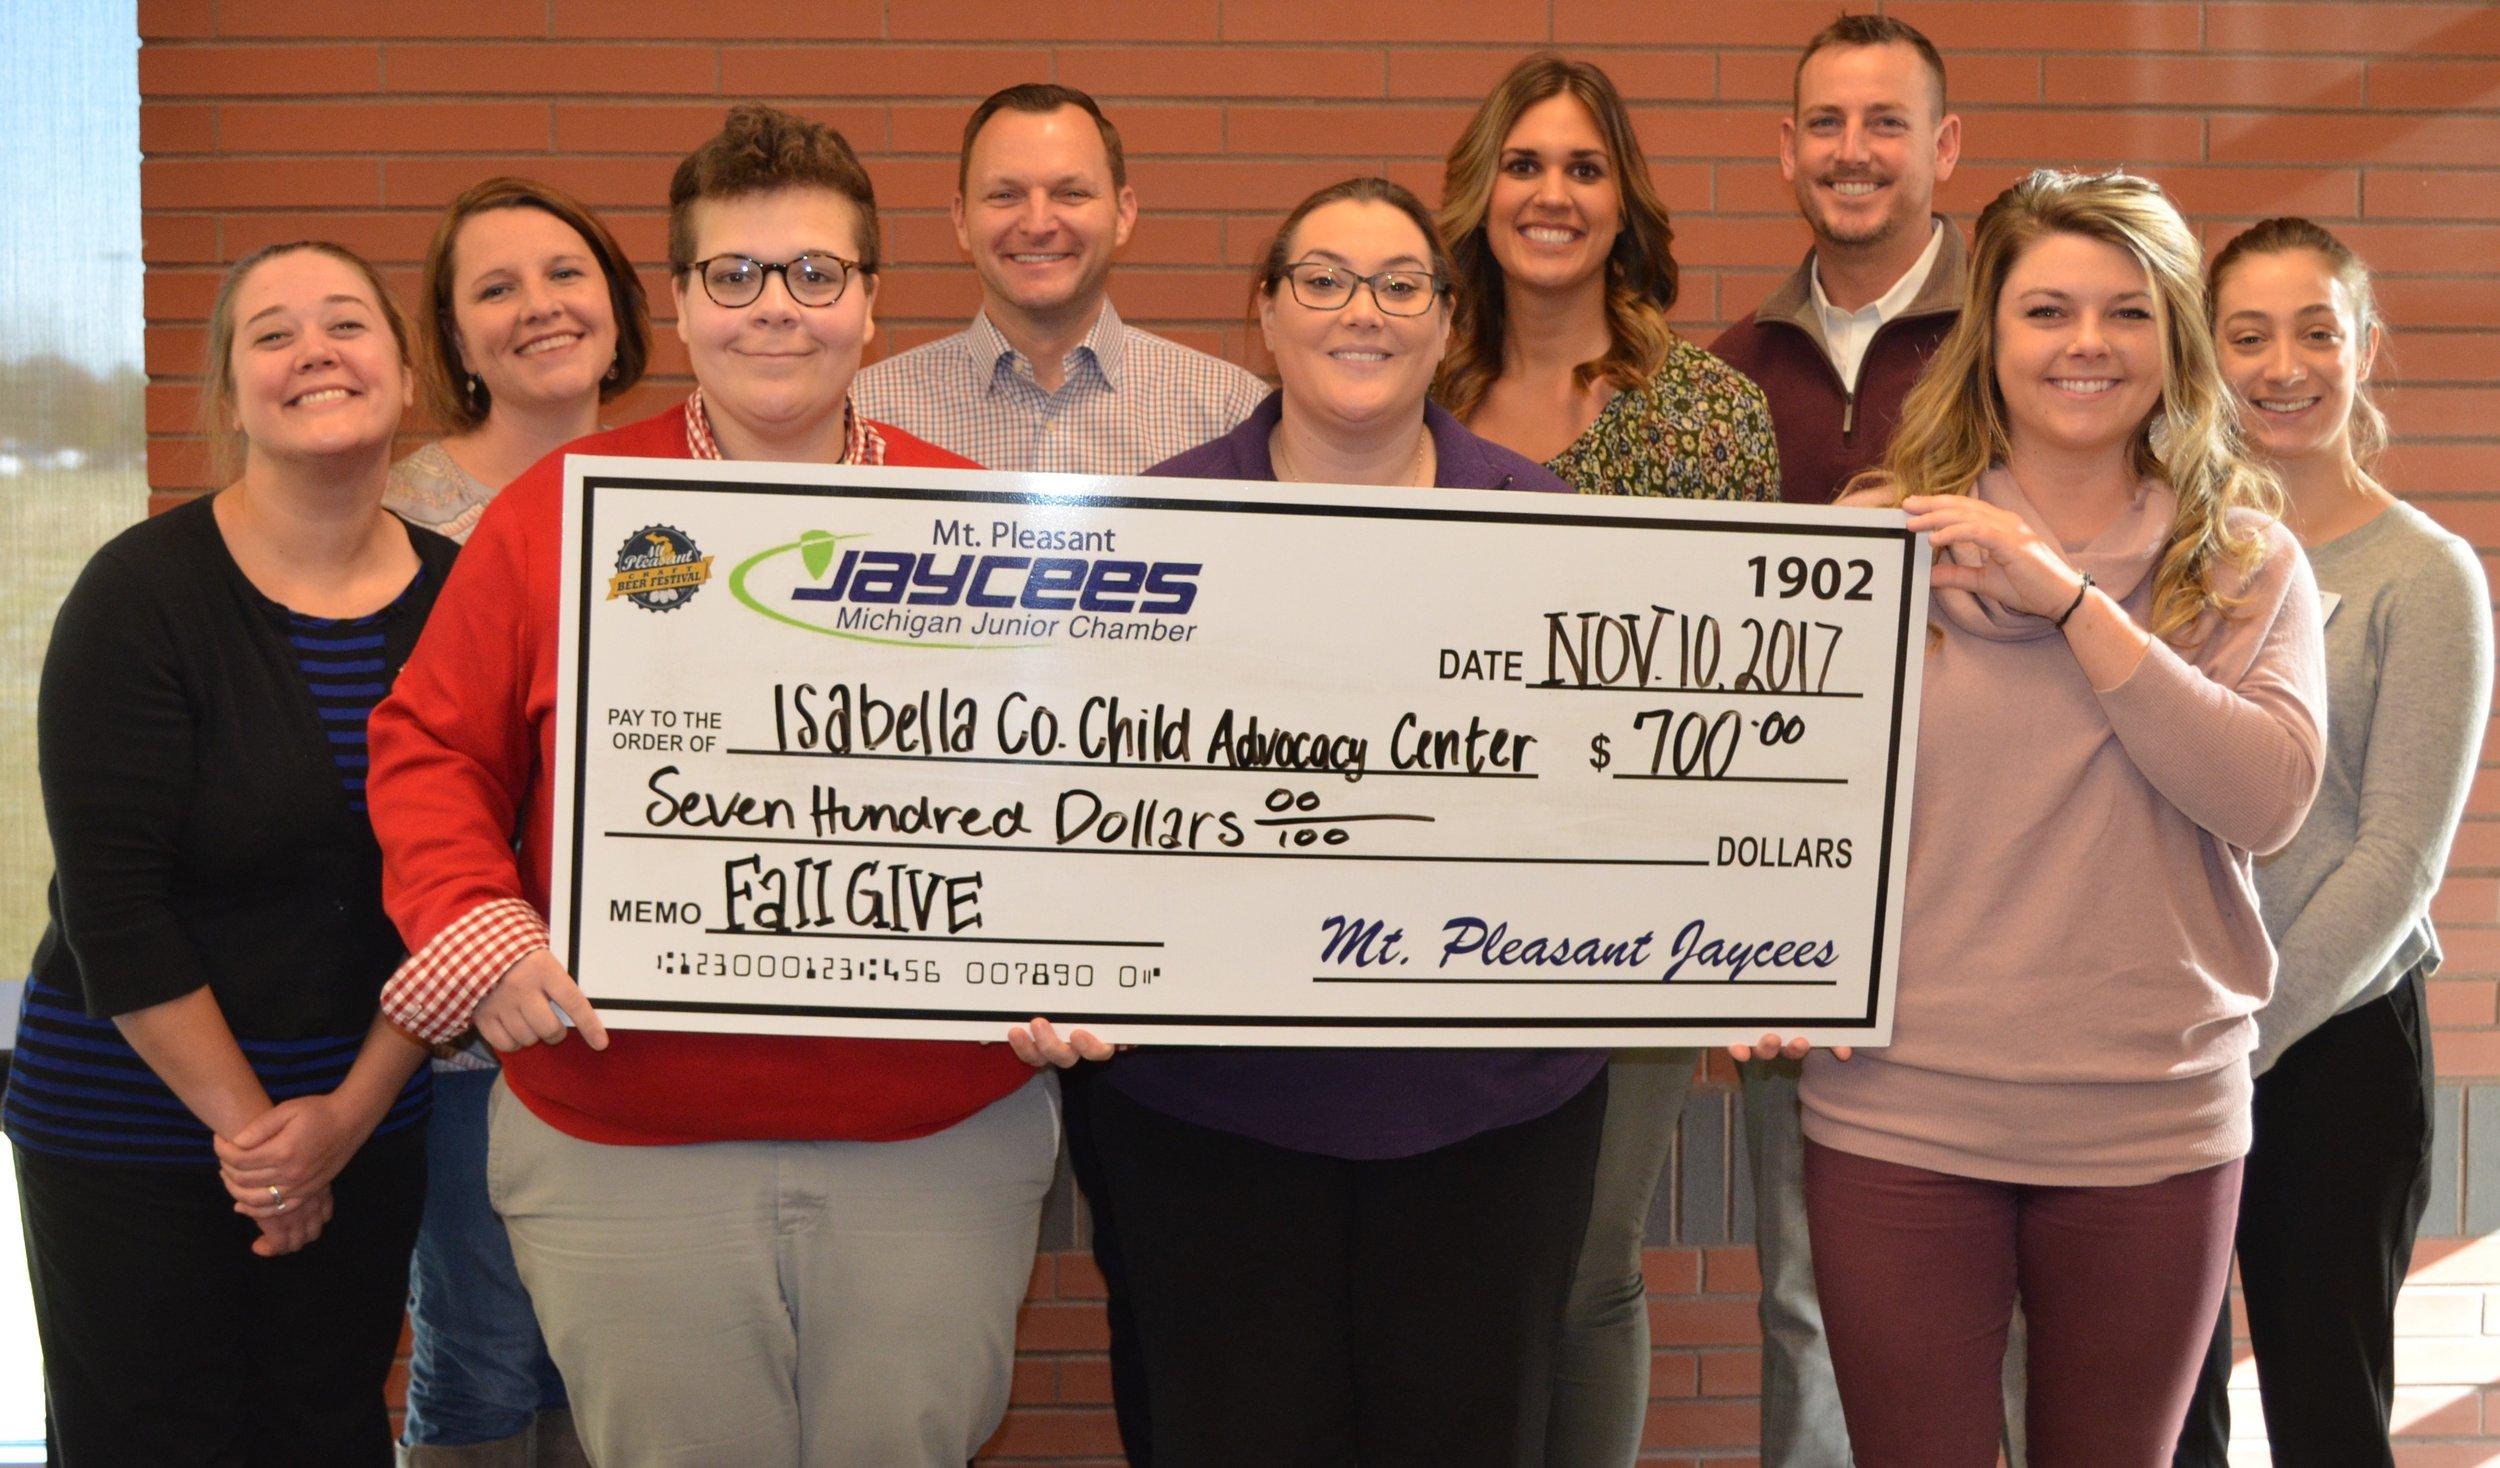 Isabella County Child Advocacy Center